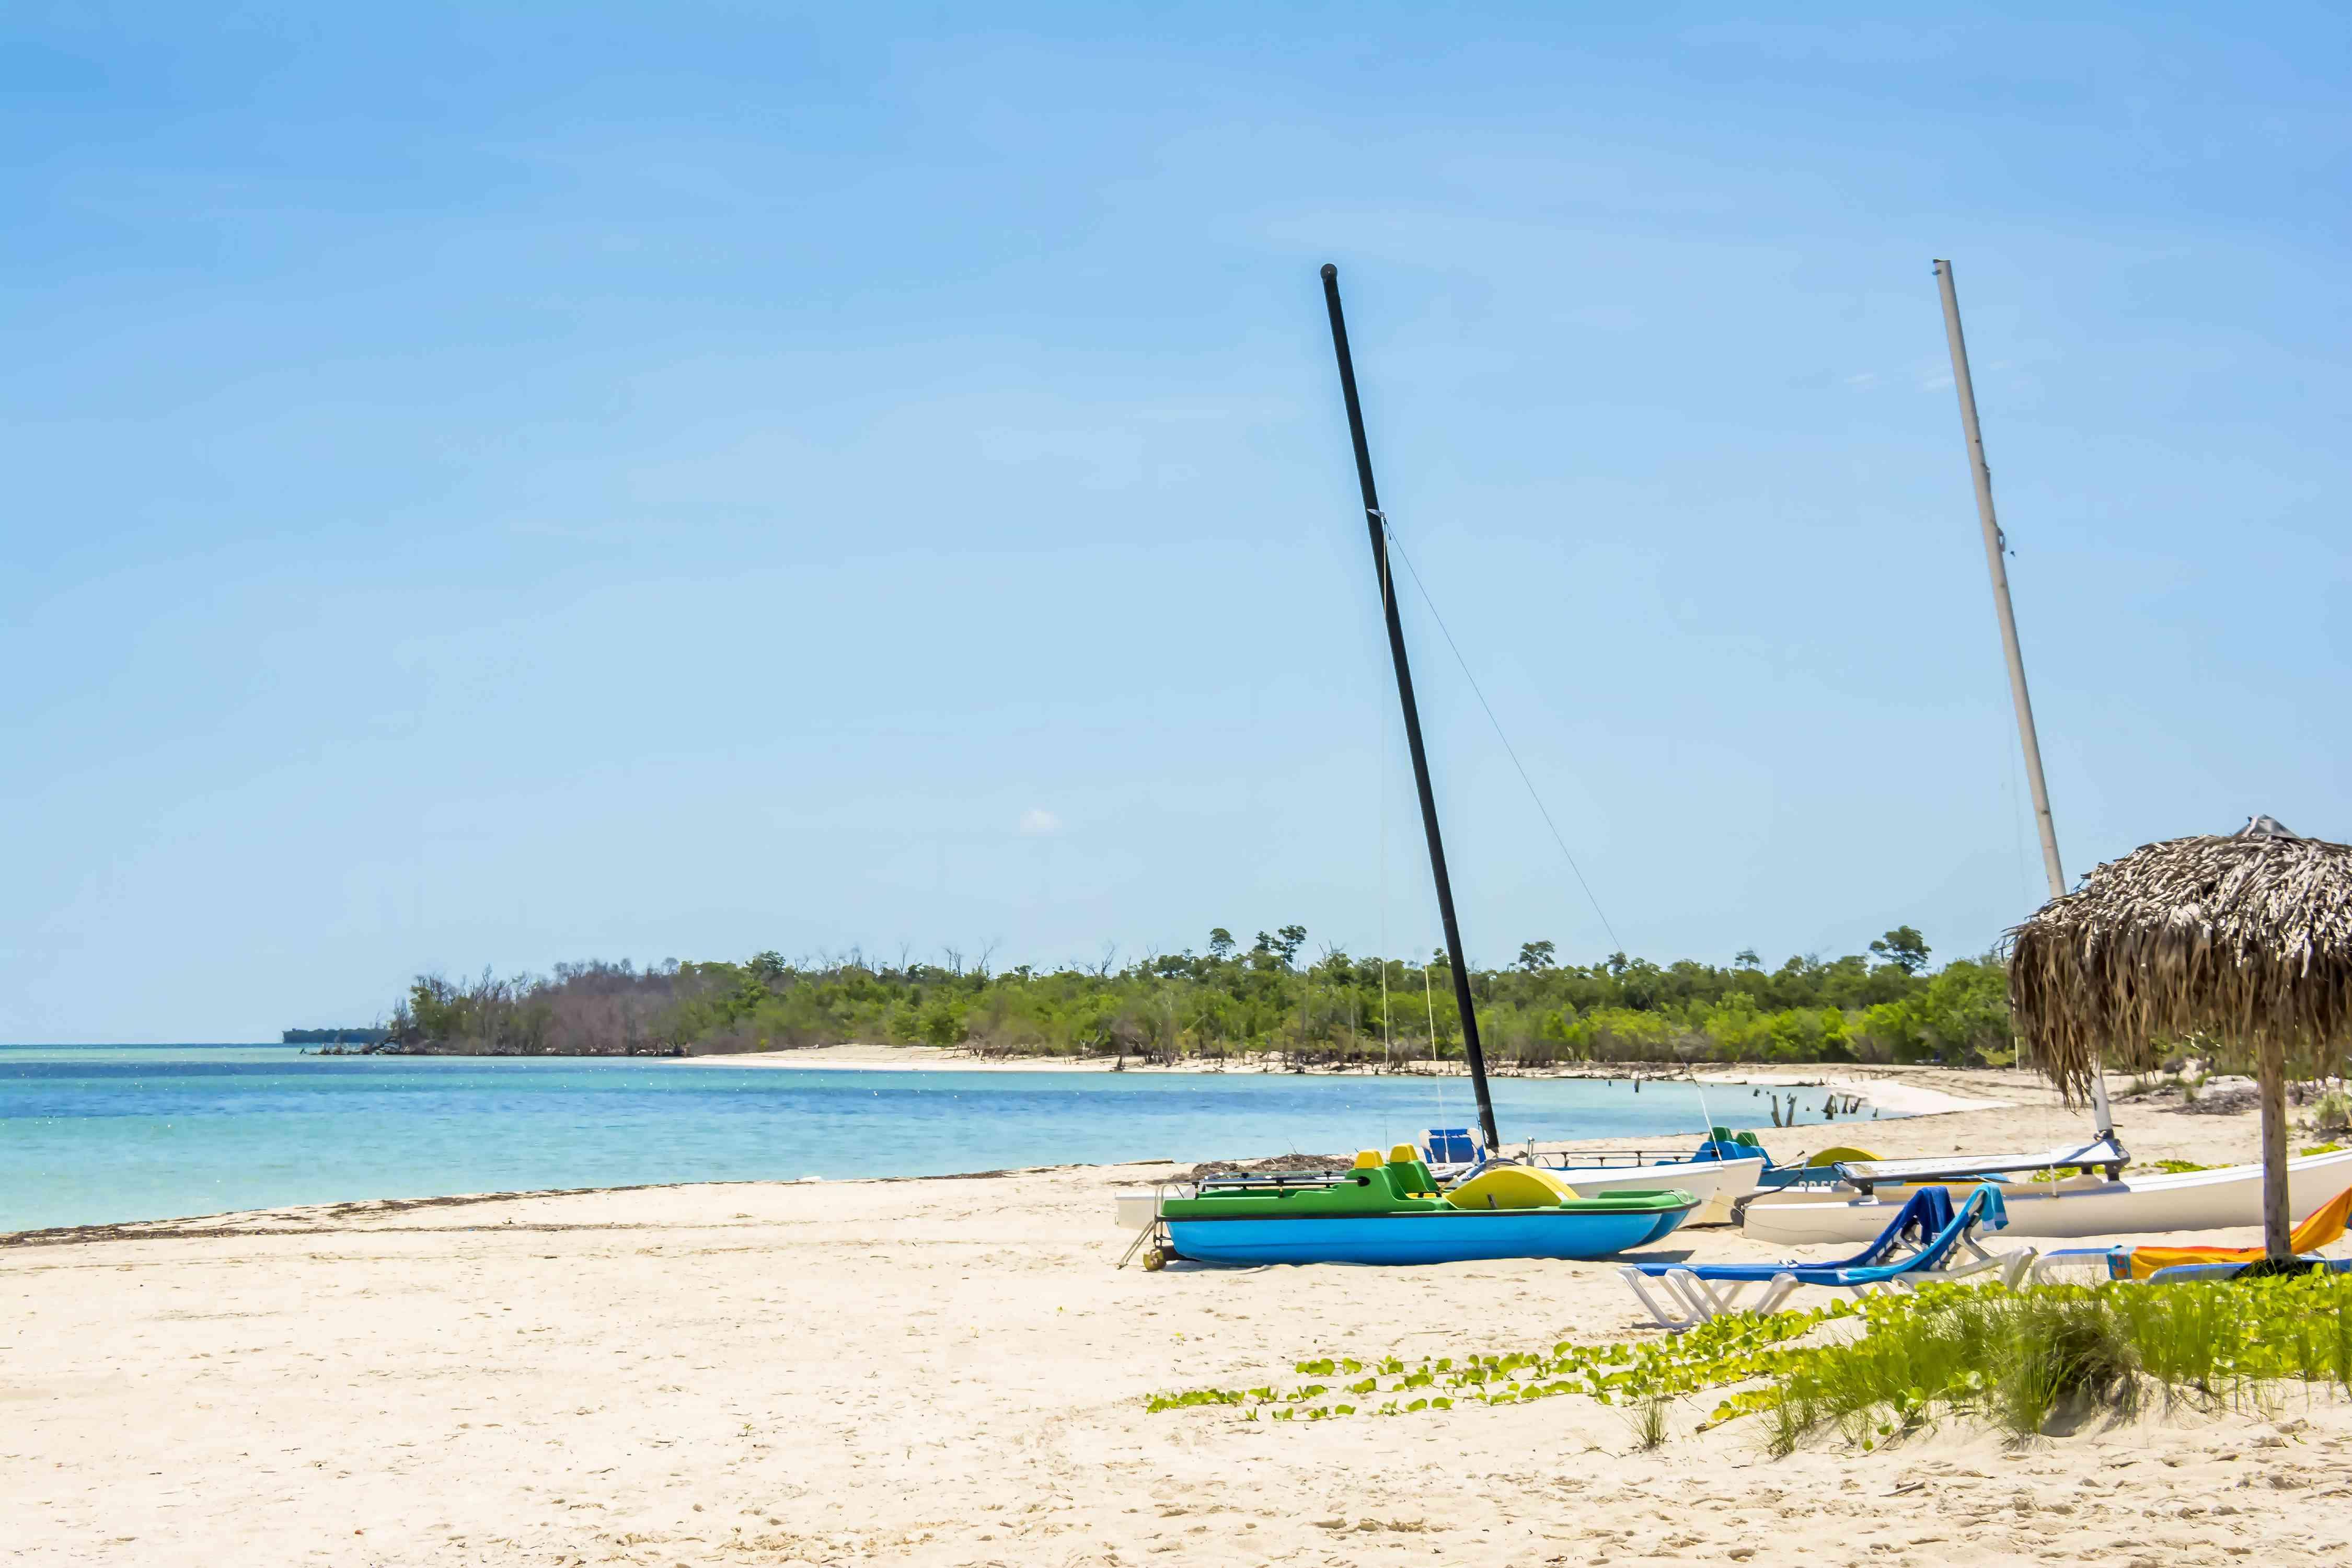 Beautiful beach and blue sky on Cayo Levisa island, Cuba.